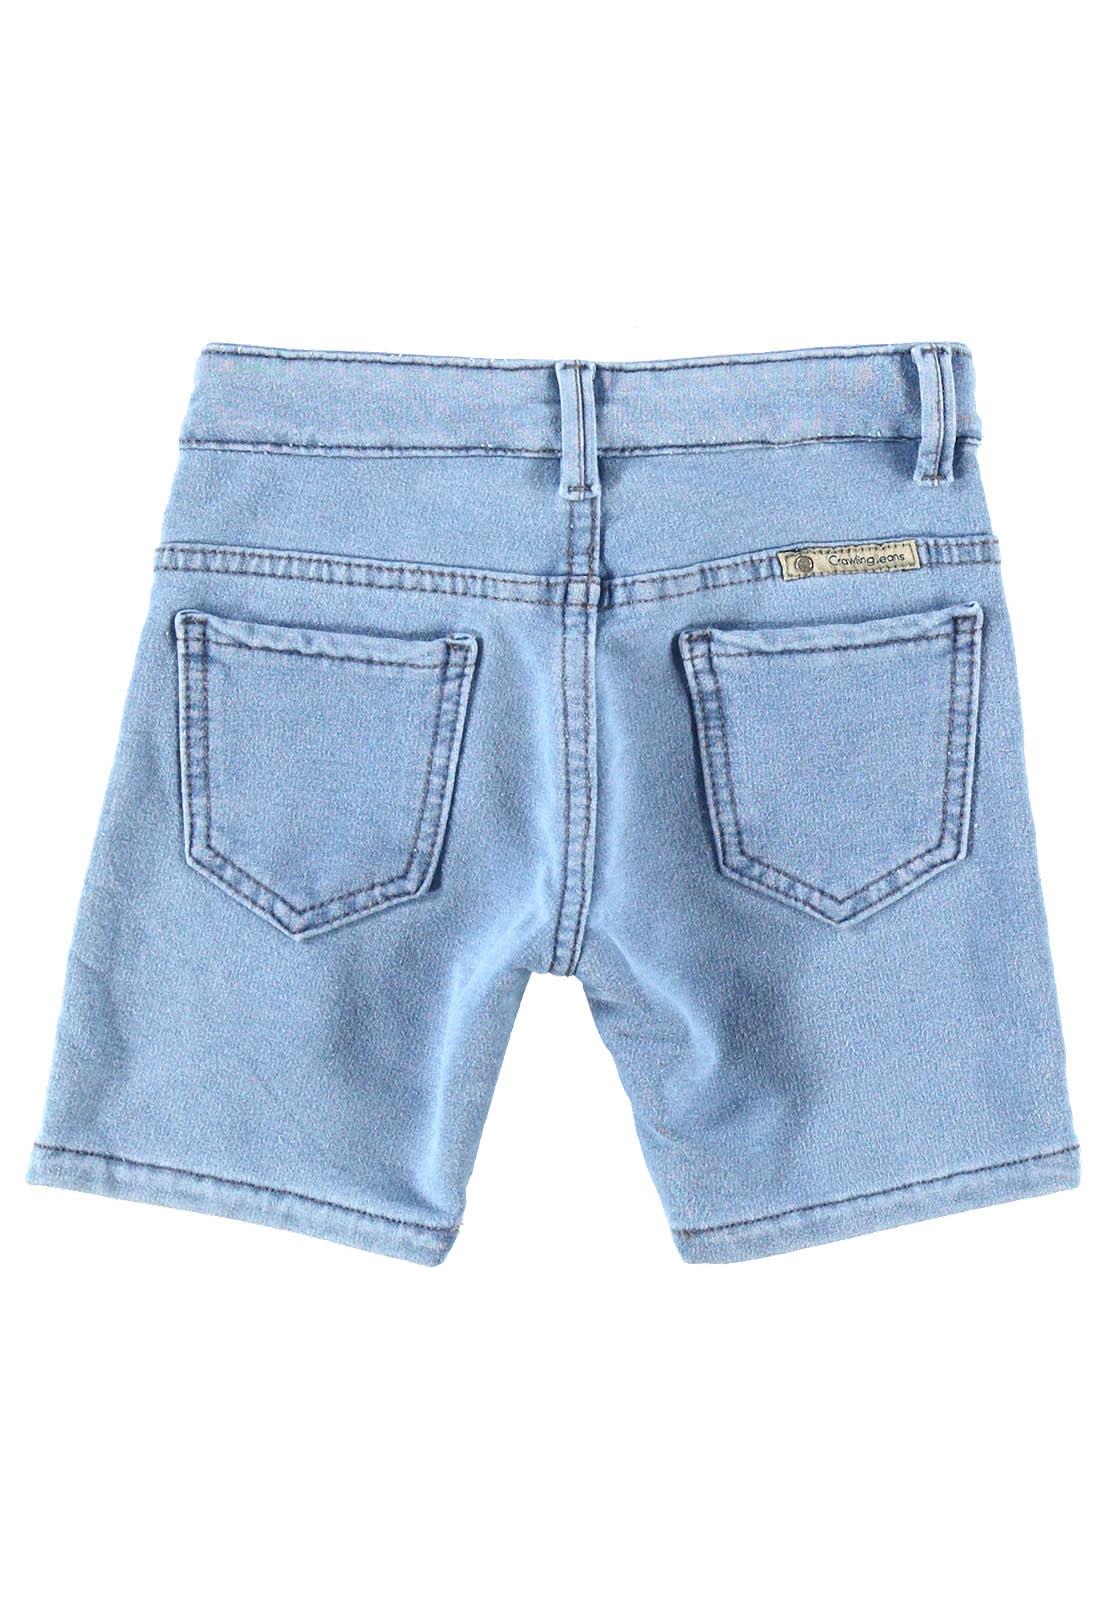 Bermuda Masculina Crawling Jeans Moletom